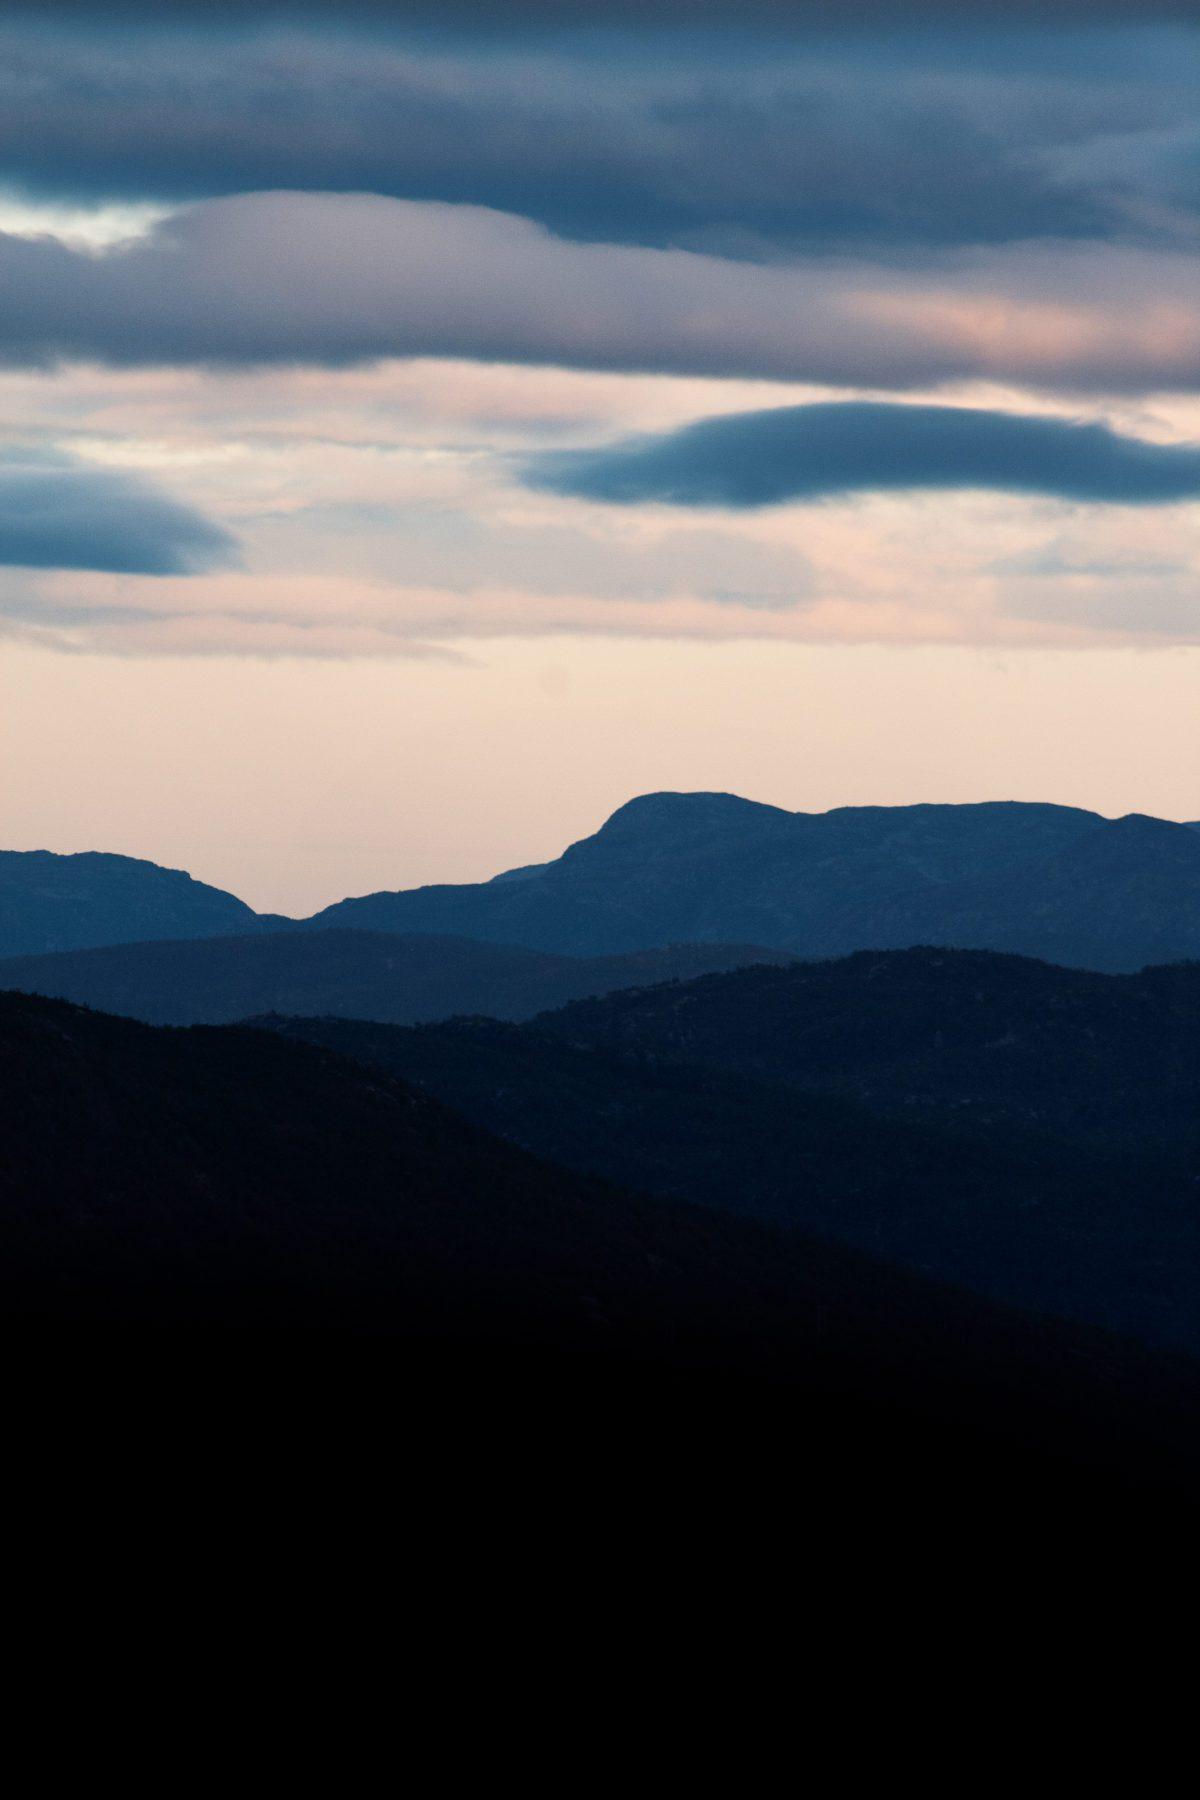 Blue Mountains, Røldal, Norway